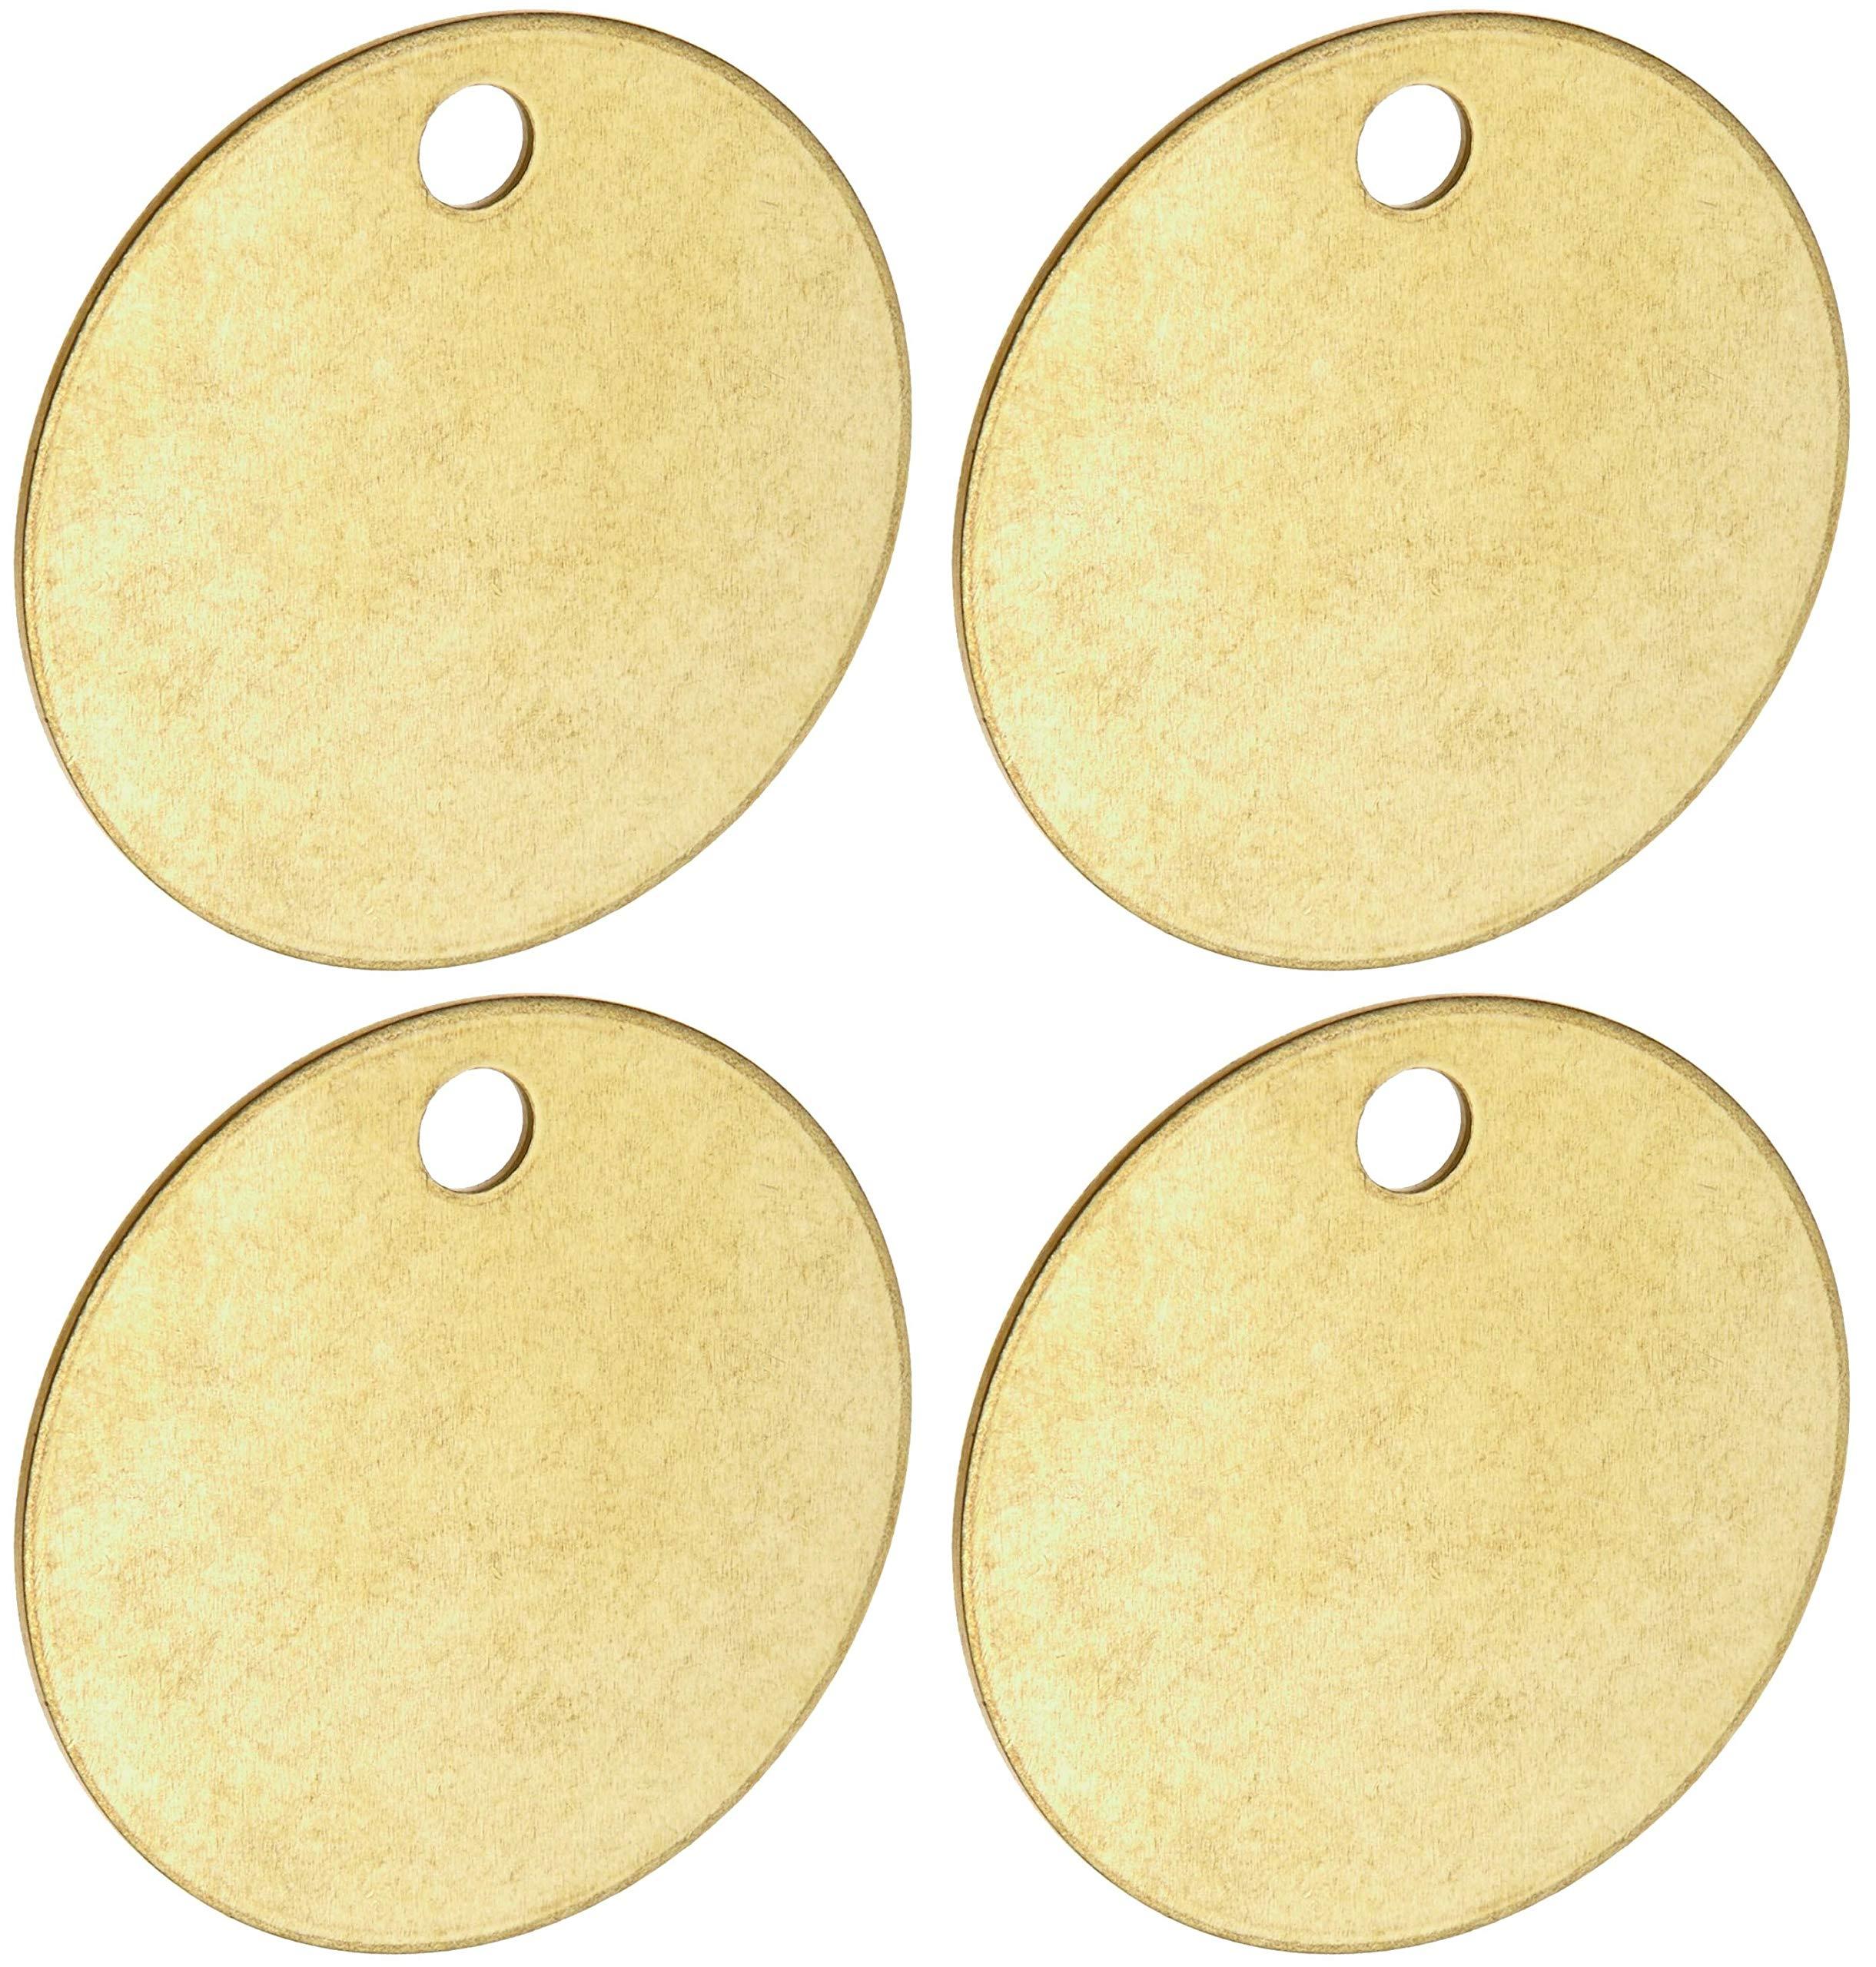 Brady Blank Valve Tags - Round Brass Tags, 1-1/2'' Diameter, B-907 (Pack of 25) - 23210 (Вundlе оf Fоur) by Brady (Image #4)